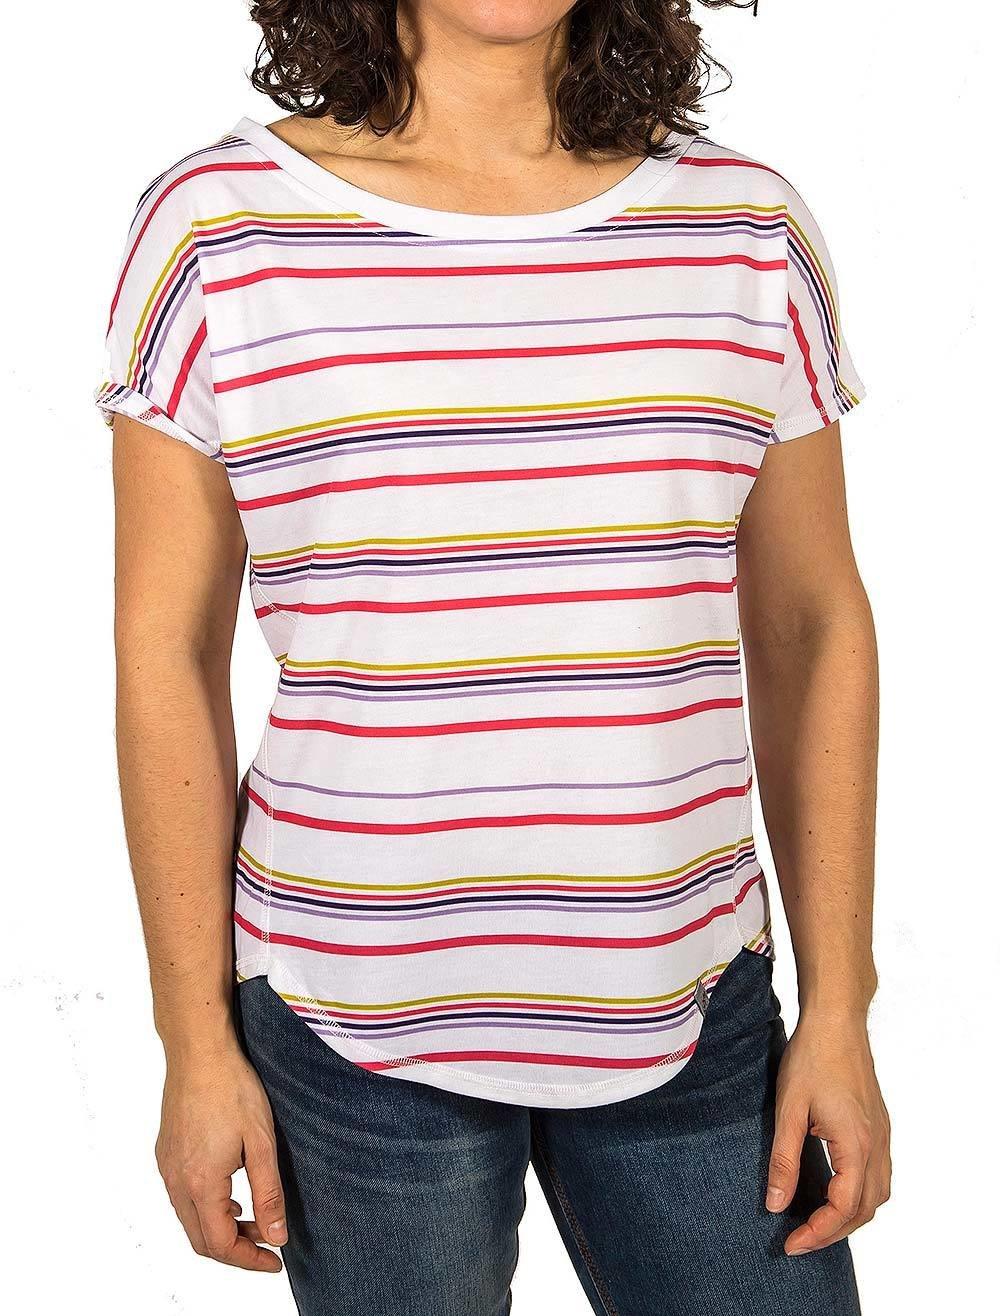 Gramicci Women's Short Sleeve Getaway Tee